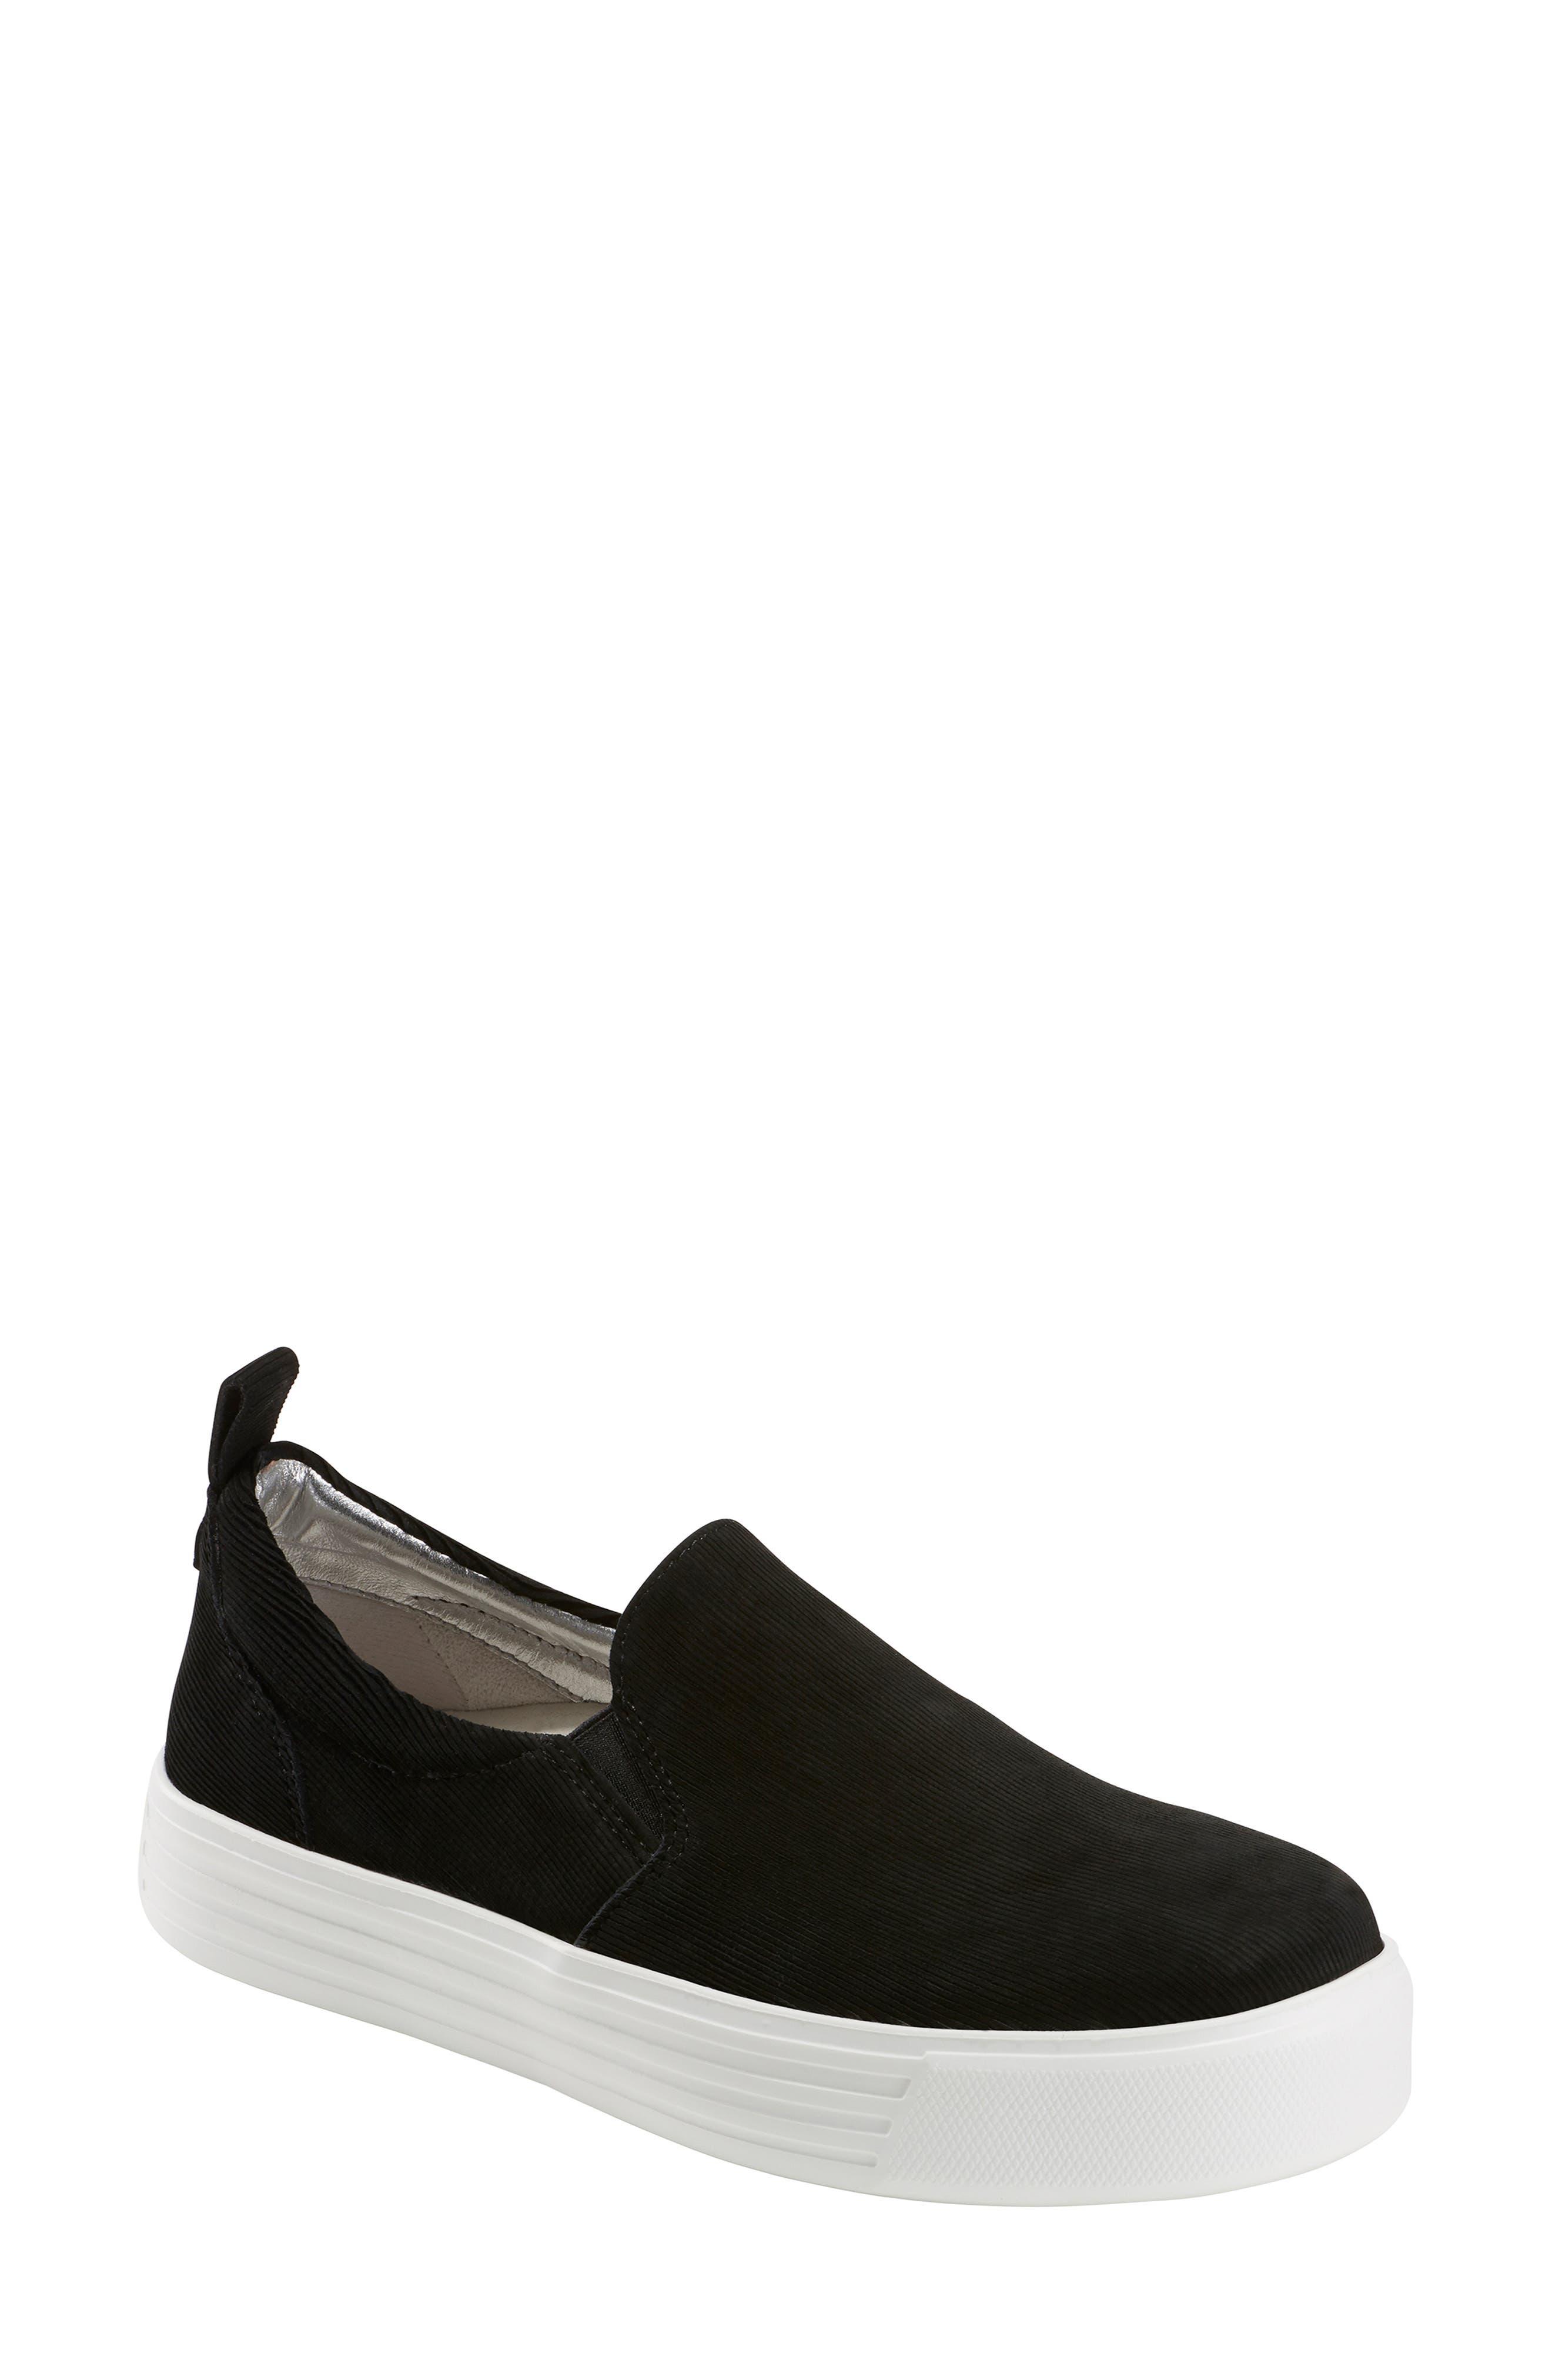 Earth Clove Sneaker, Black